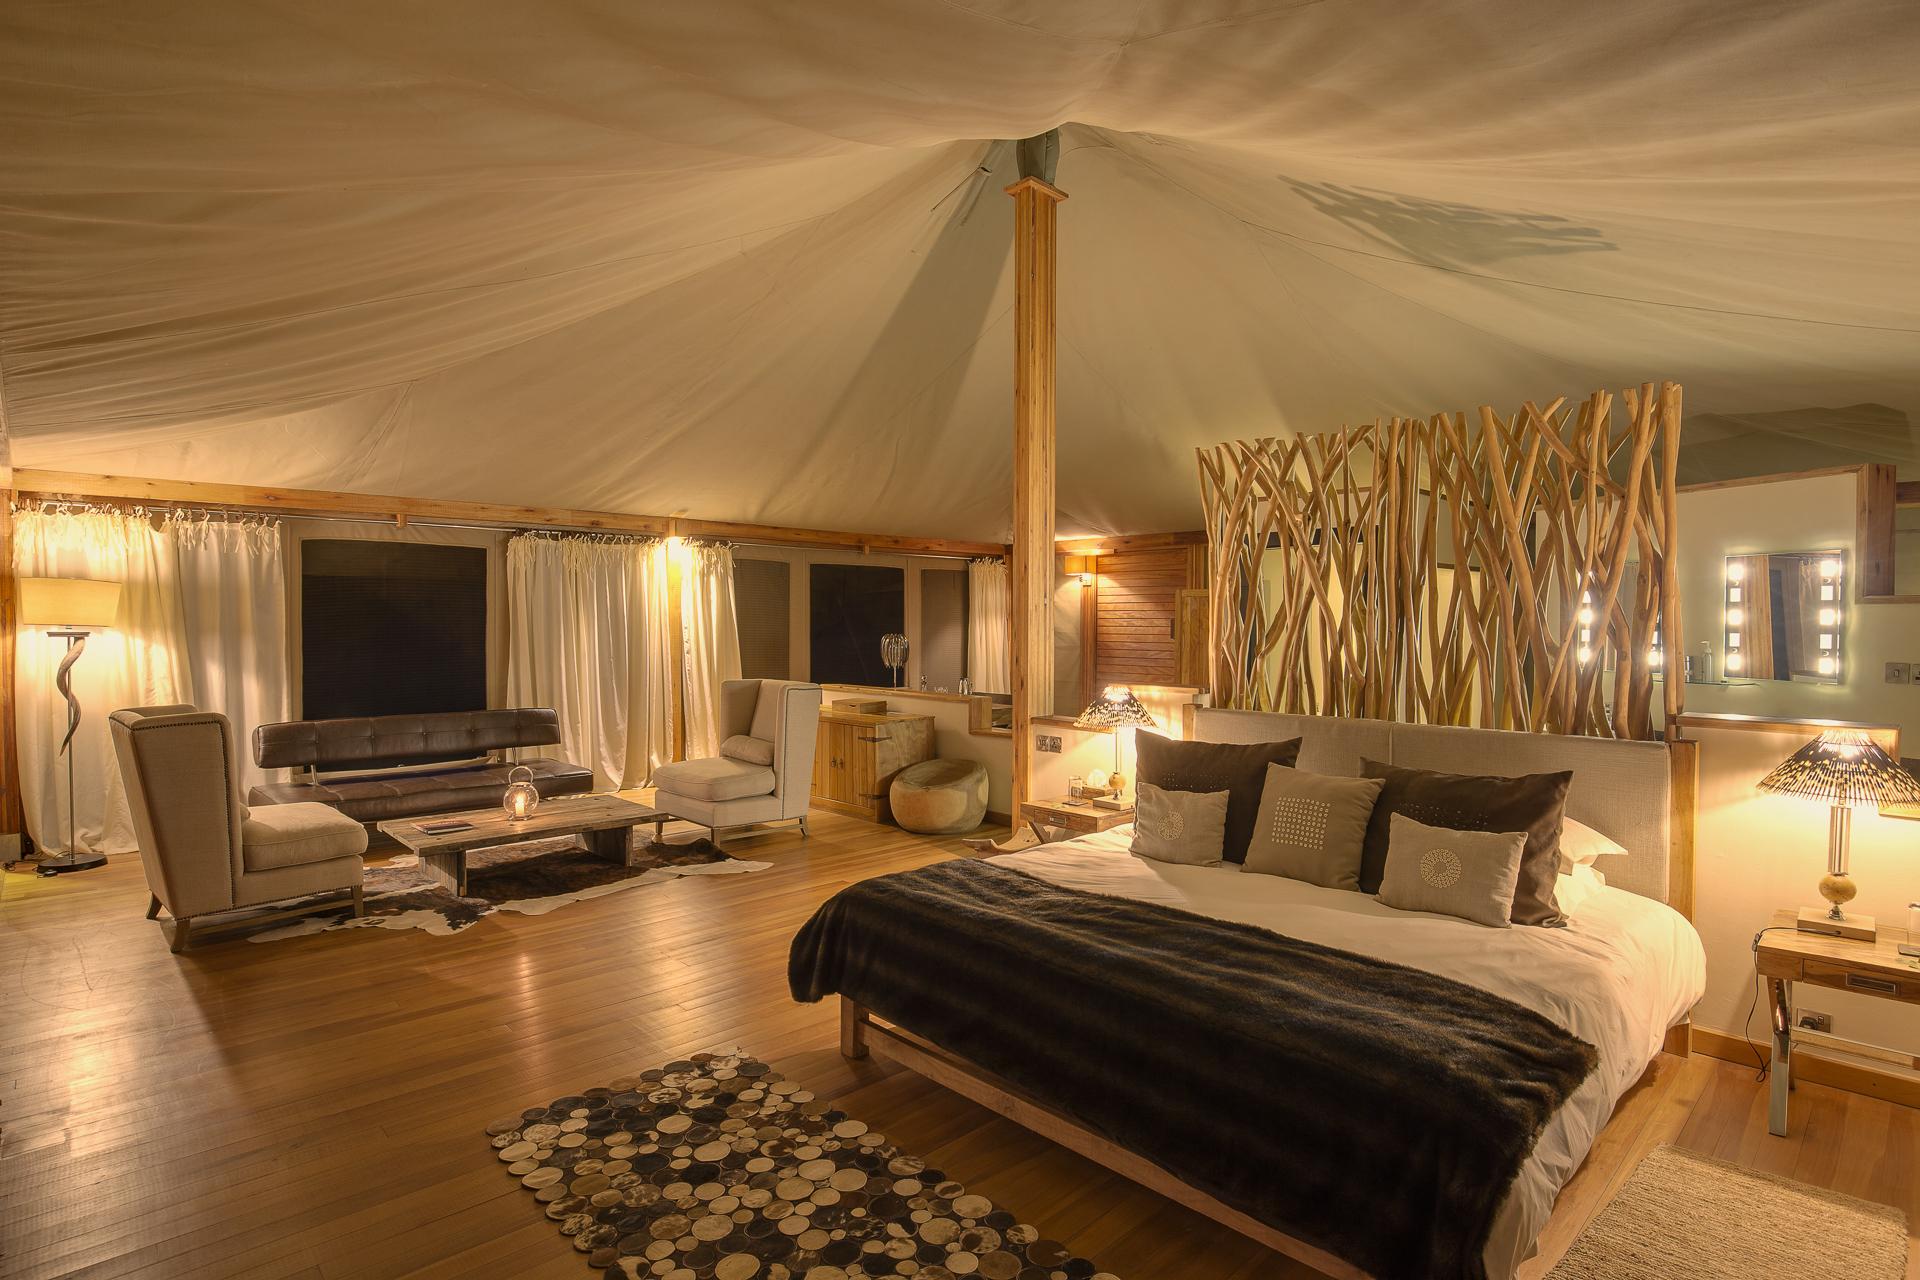 Elewana Loisaba Tented Camp - accommodation - spacious luxury tents - interior (c) Mario Moreno- 3.jpg